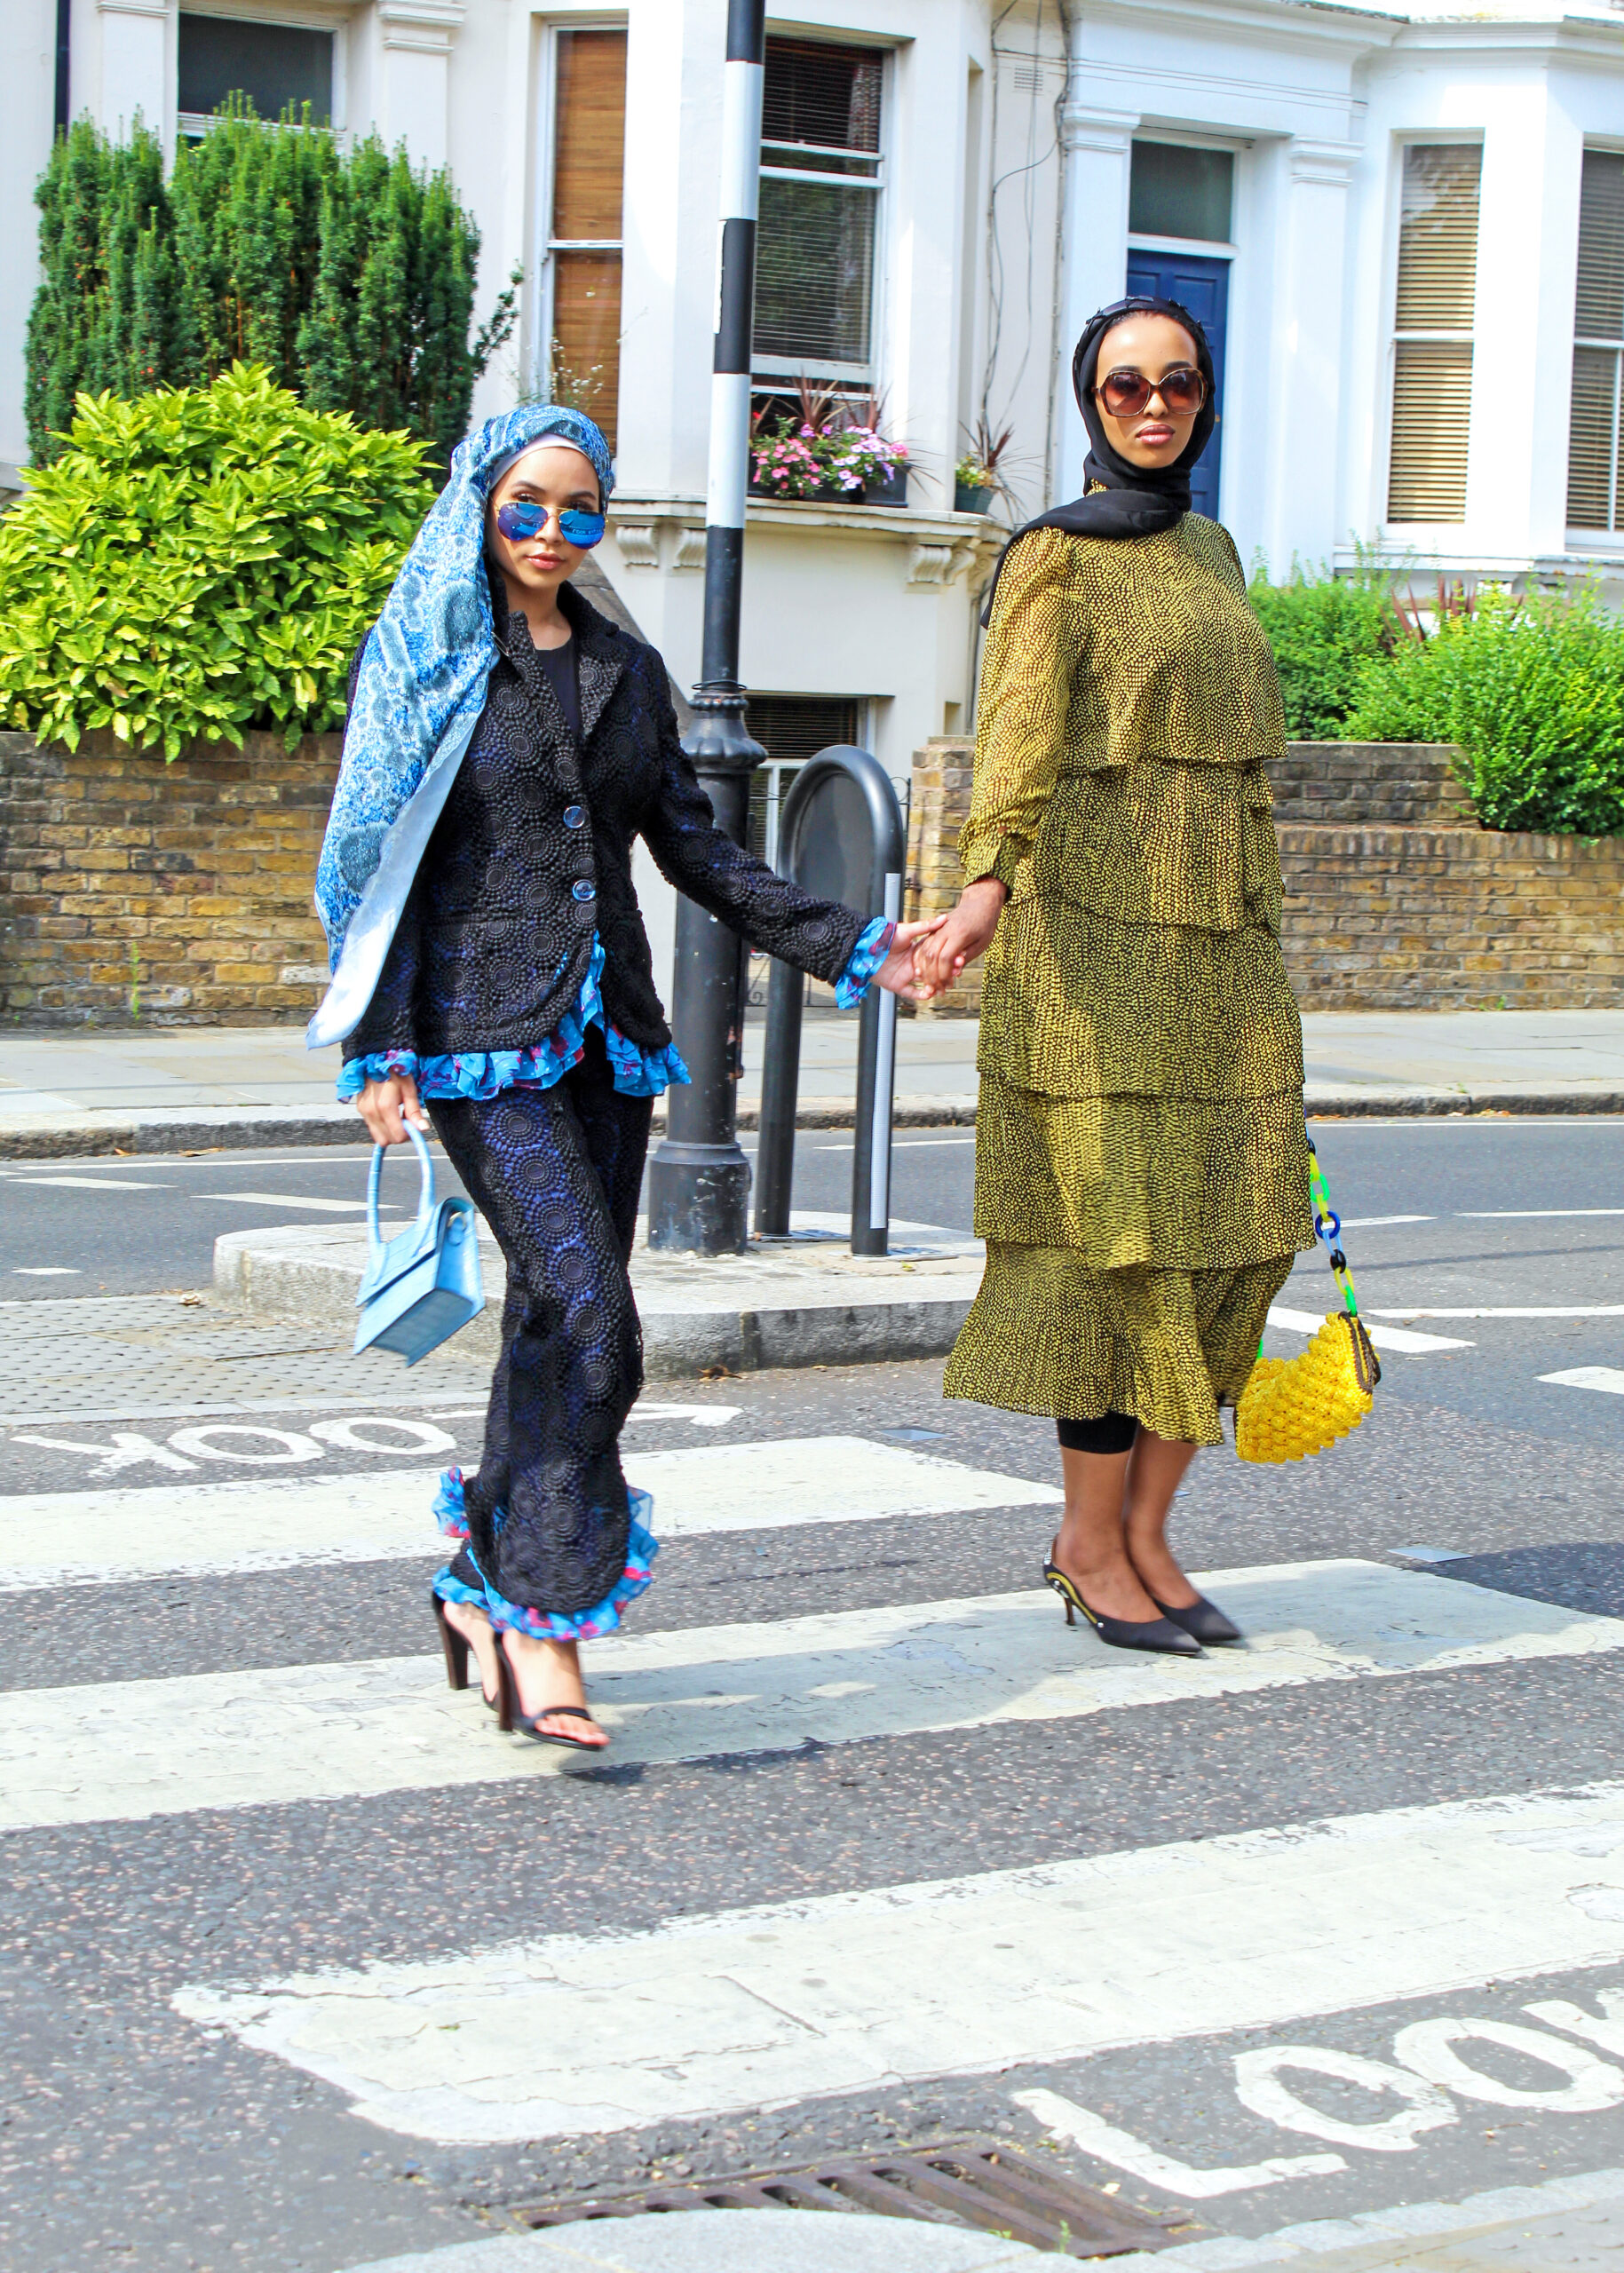 Ayan and Amina 2